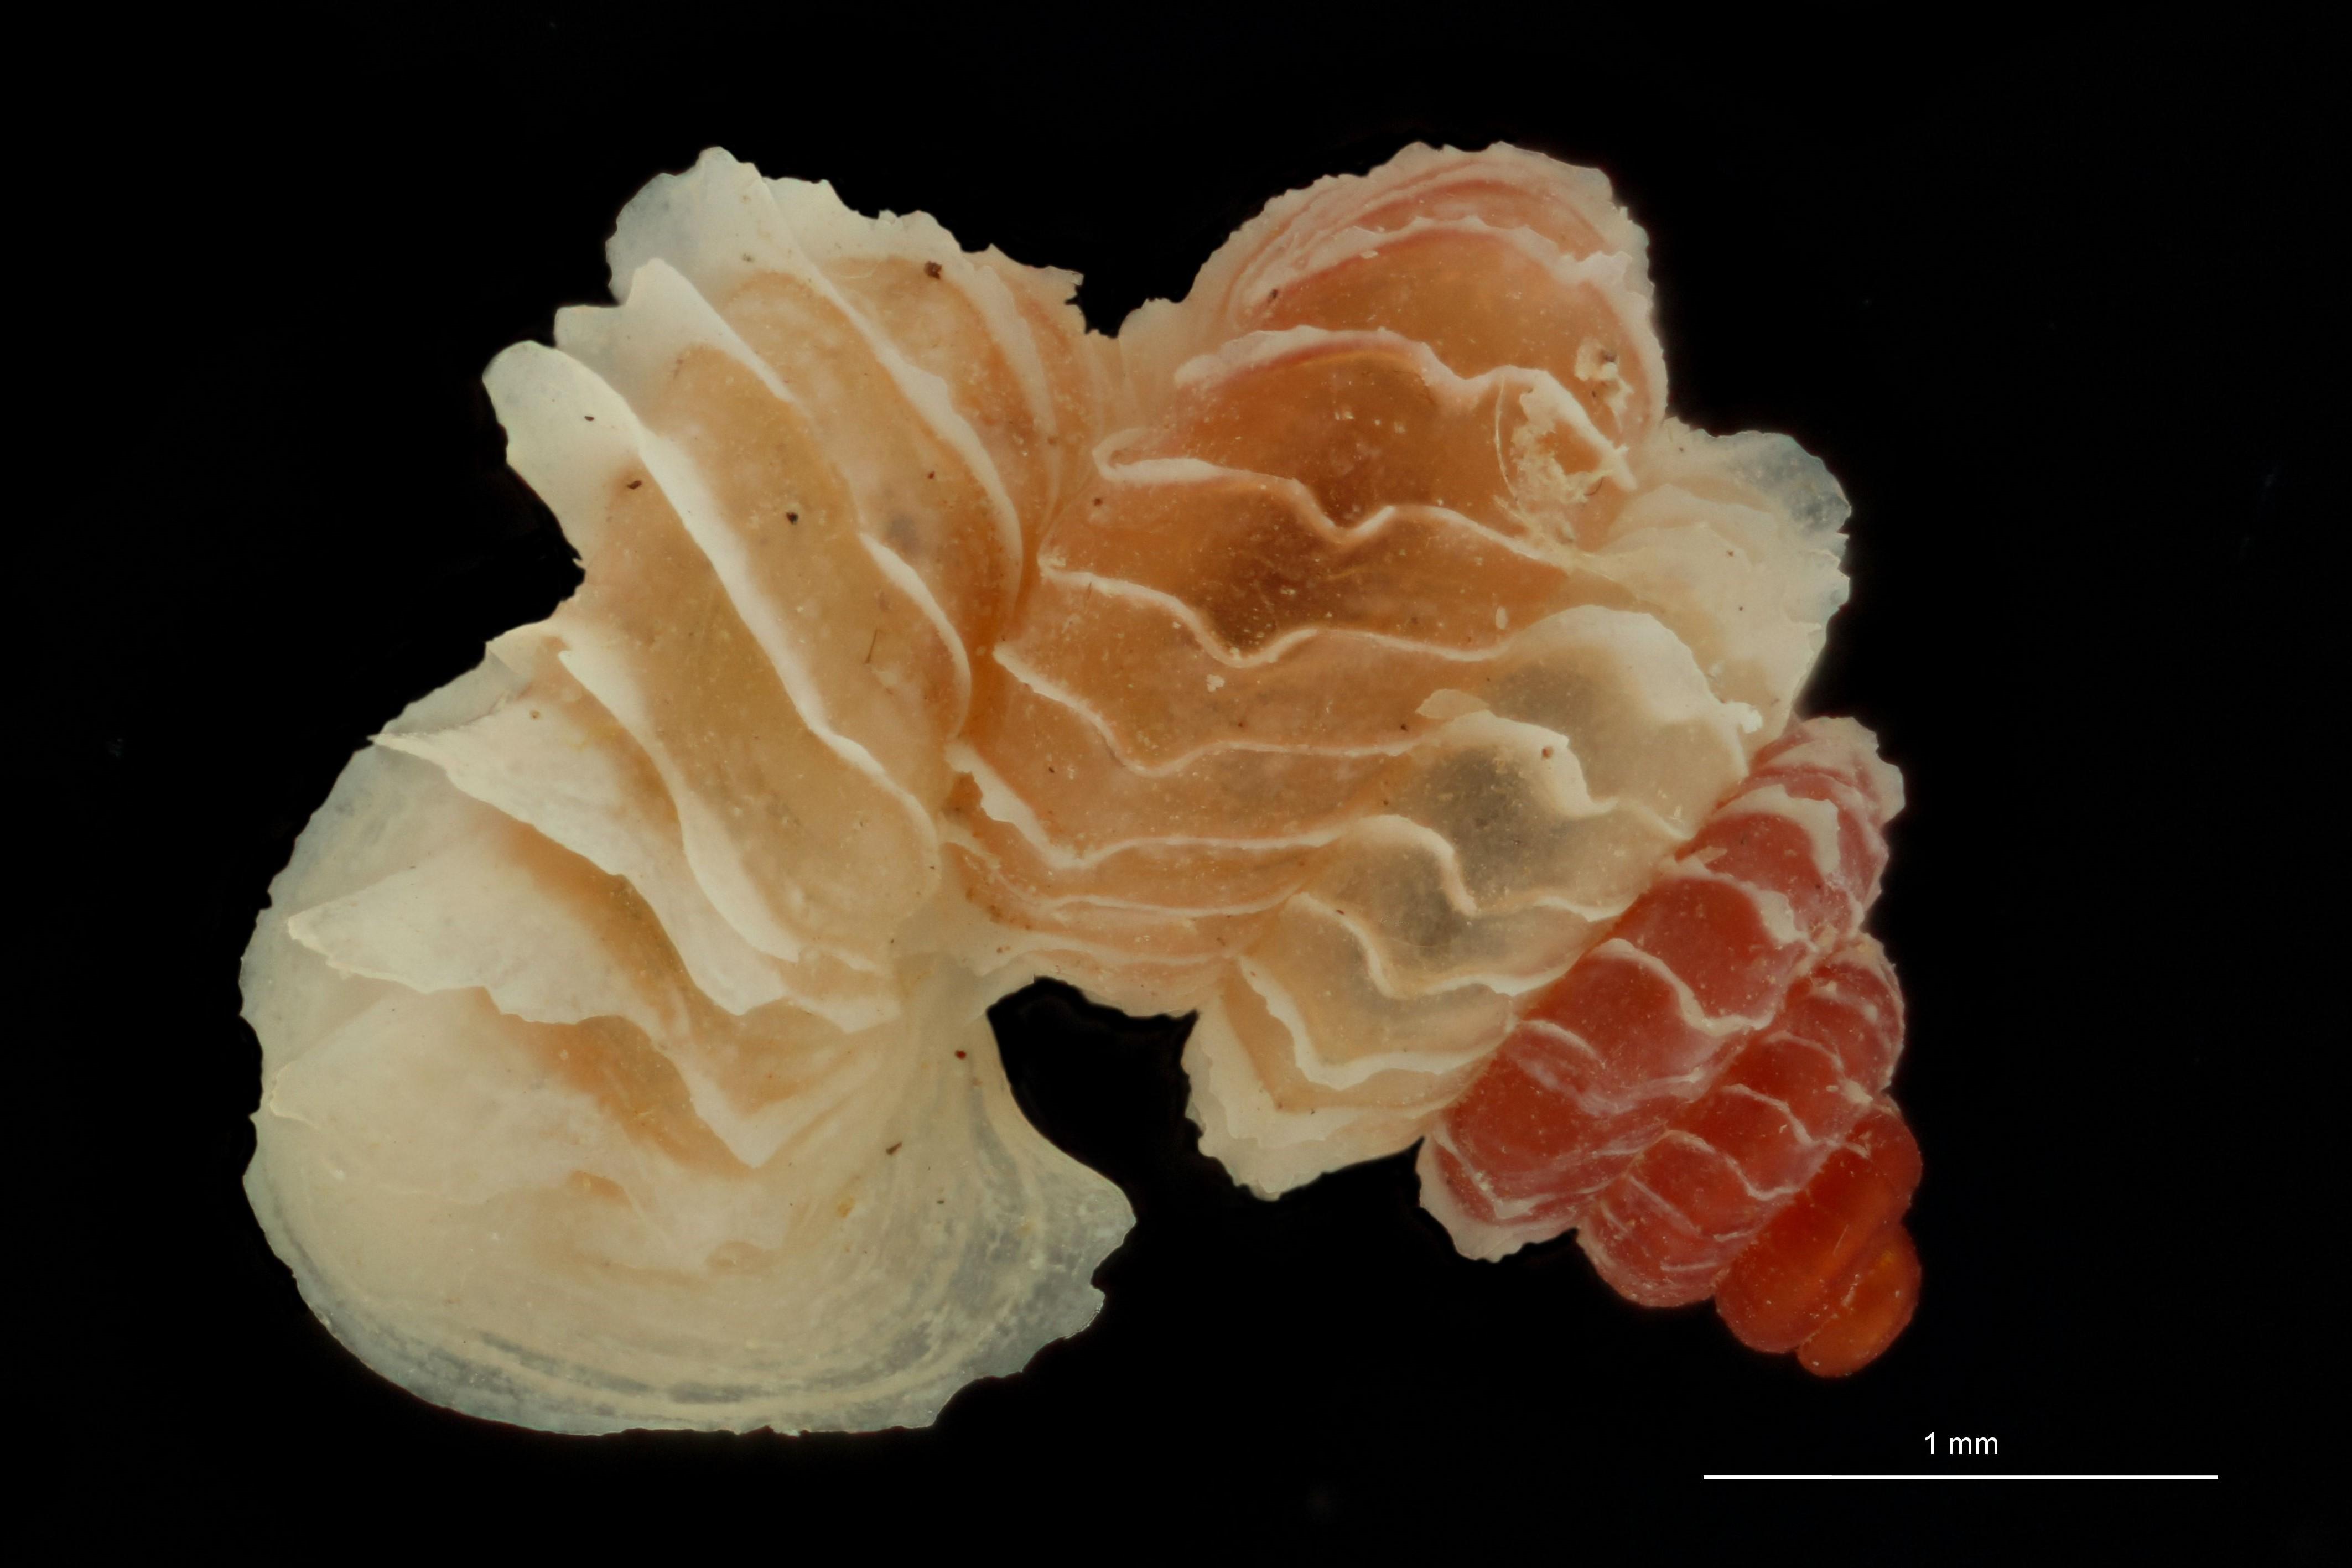 BE-RBINS-INV PARATYPE MT 1032 Opisthostoma (Geothauma) linterae DORSAL.jpg